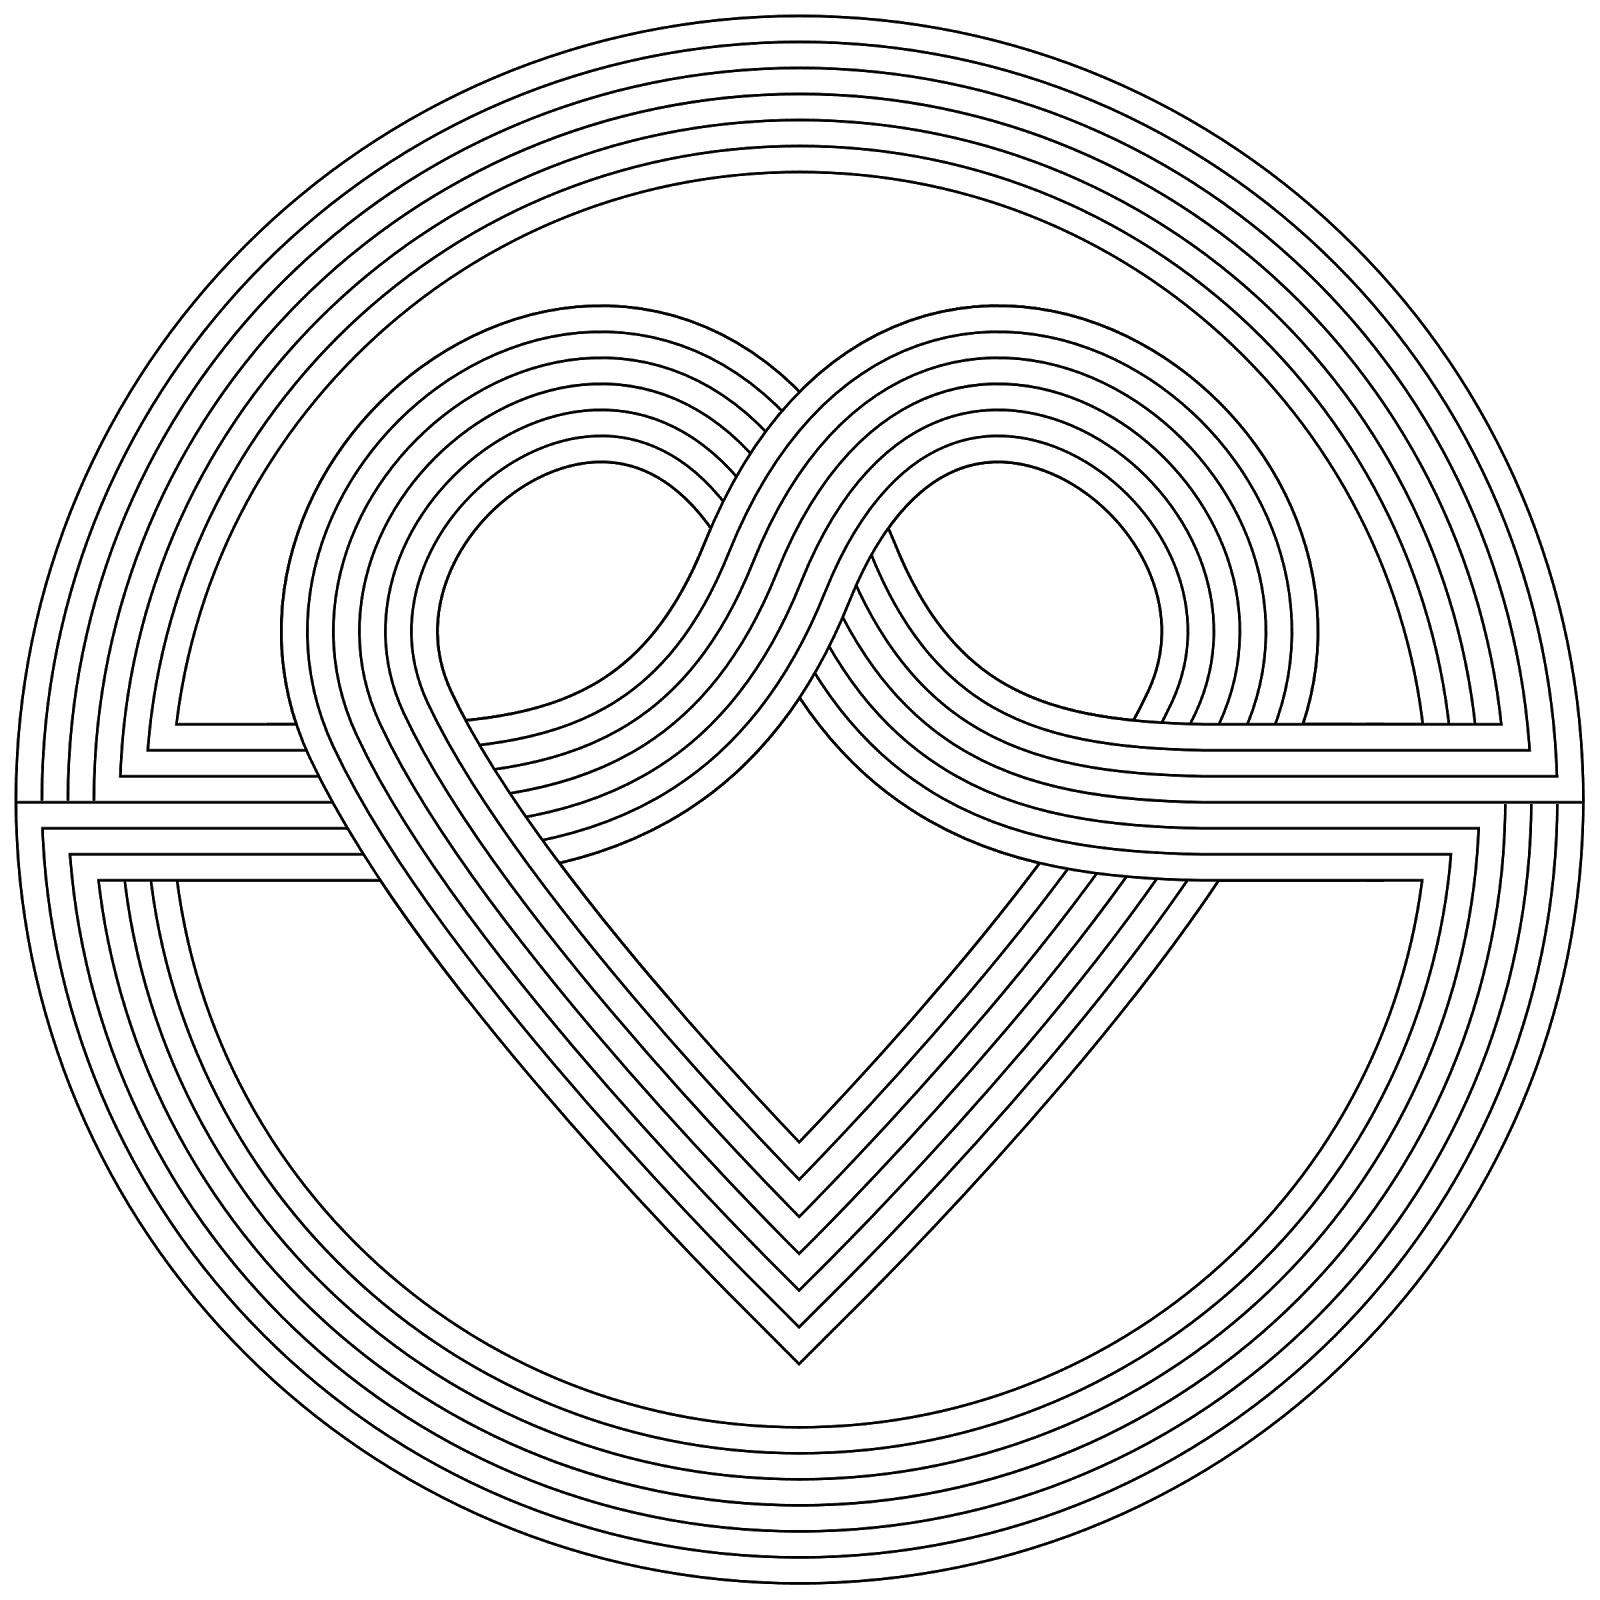 Сердце Раскраски антистресс бесплатно